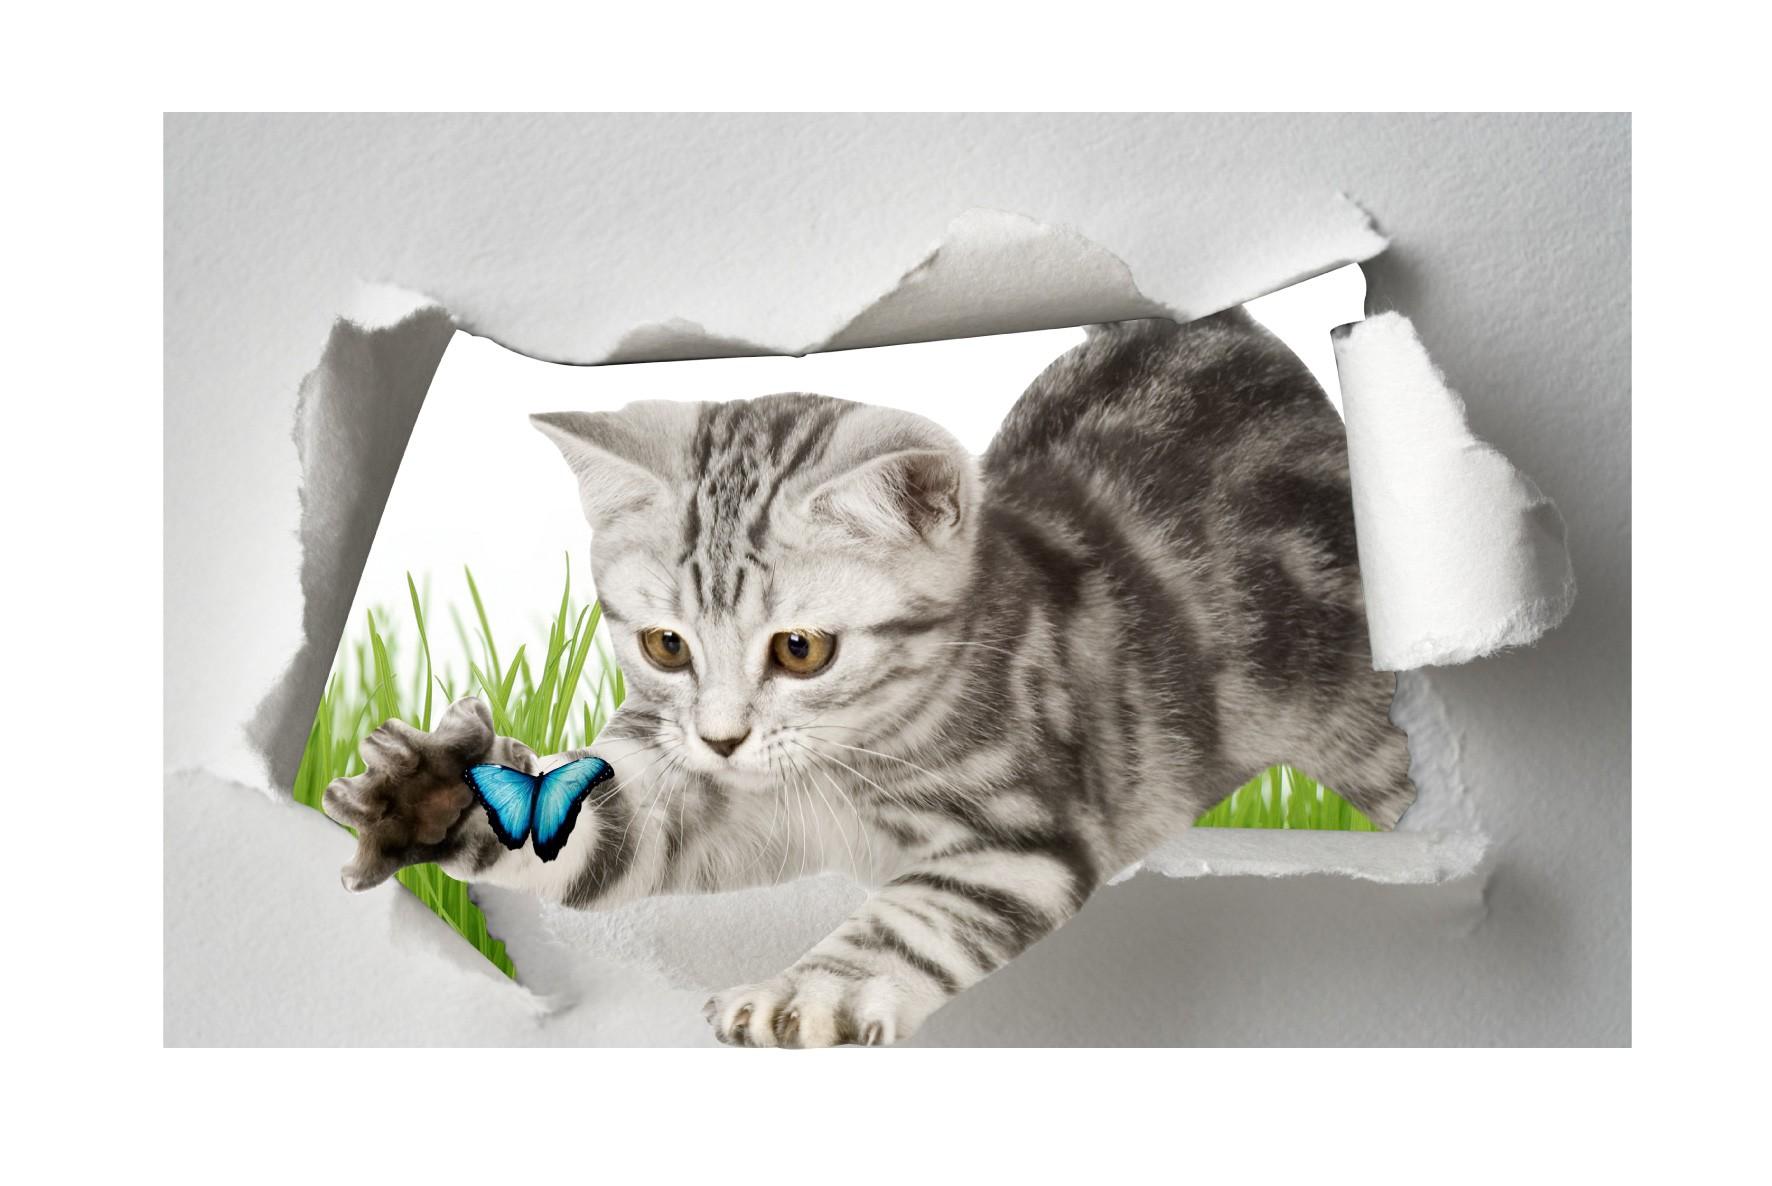 Dessin oeil de chat - Stickers muraux trompe l oeil ...